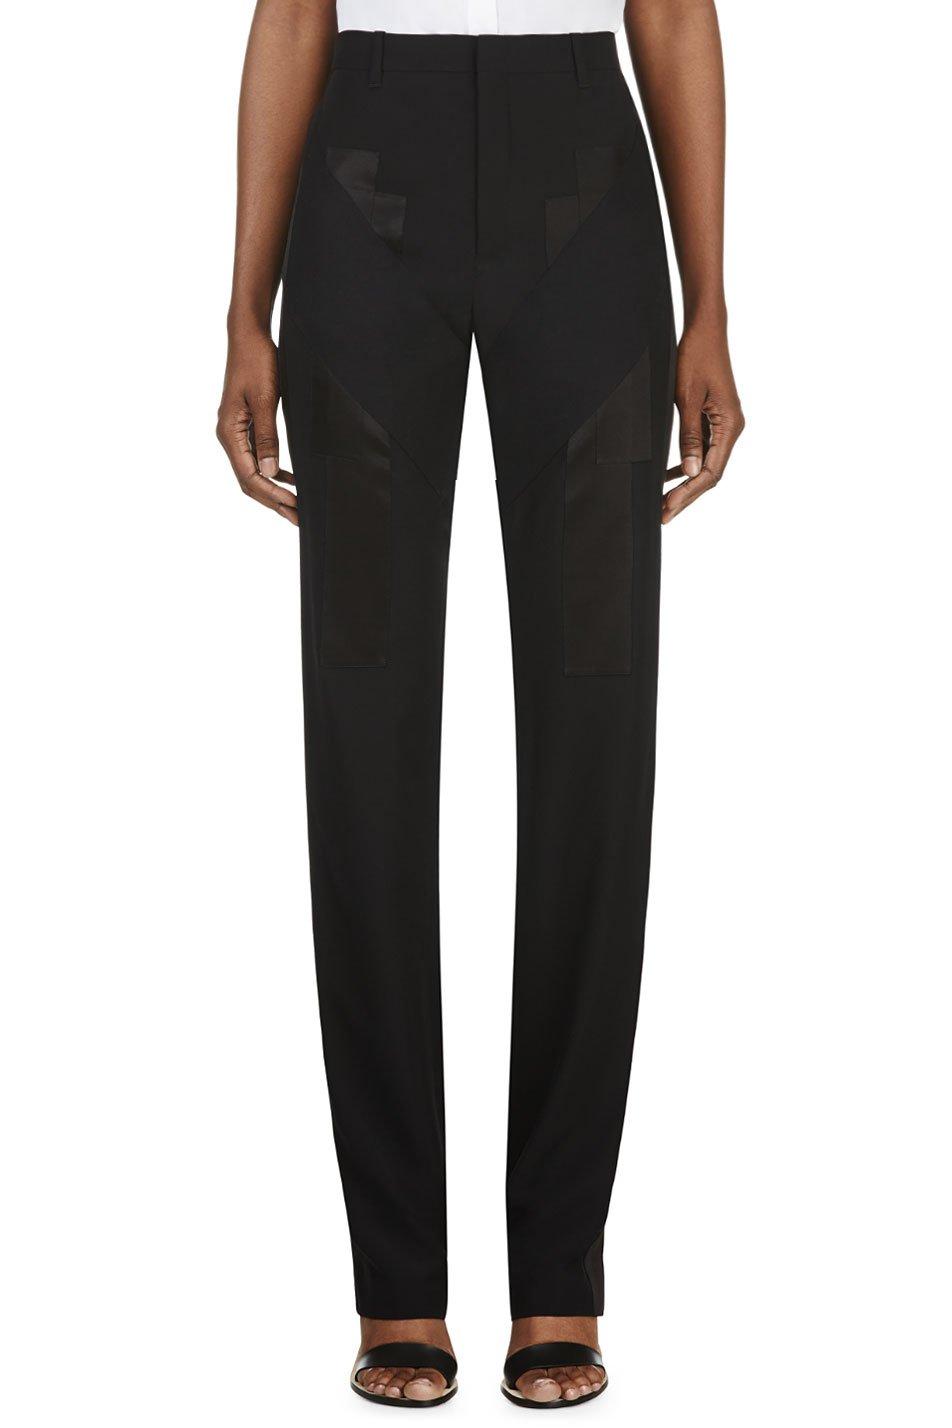 givenchy black satin appliqu trousers